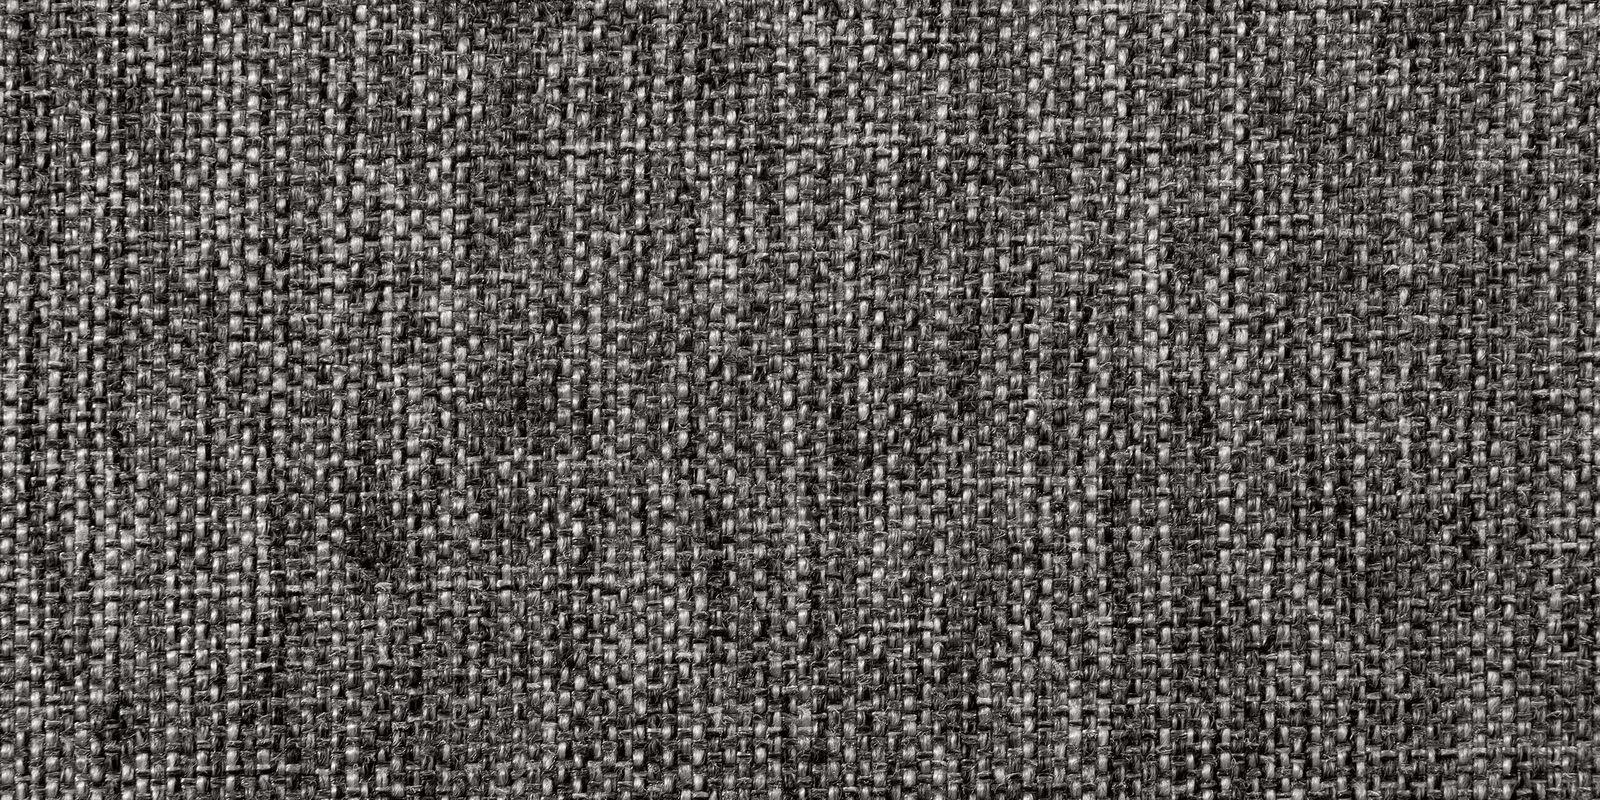 Диван Парма темно-серый рогожка фото 8 | интернет-магазин Складно